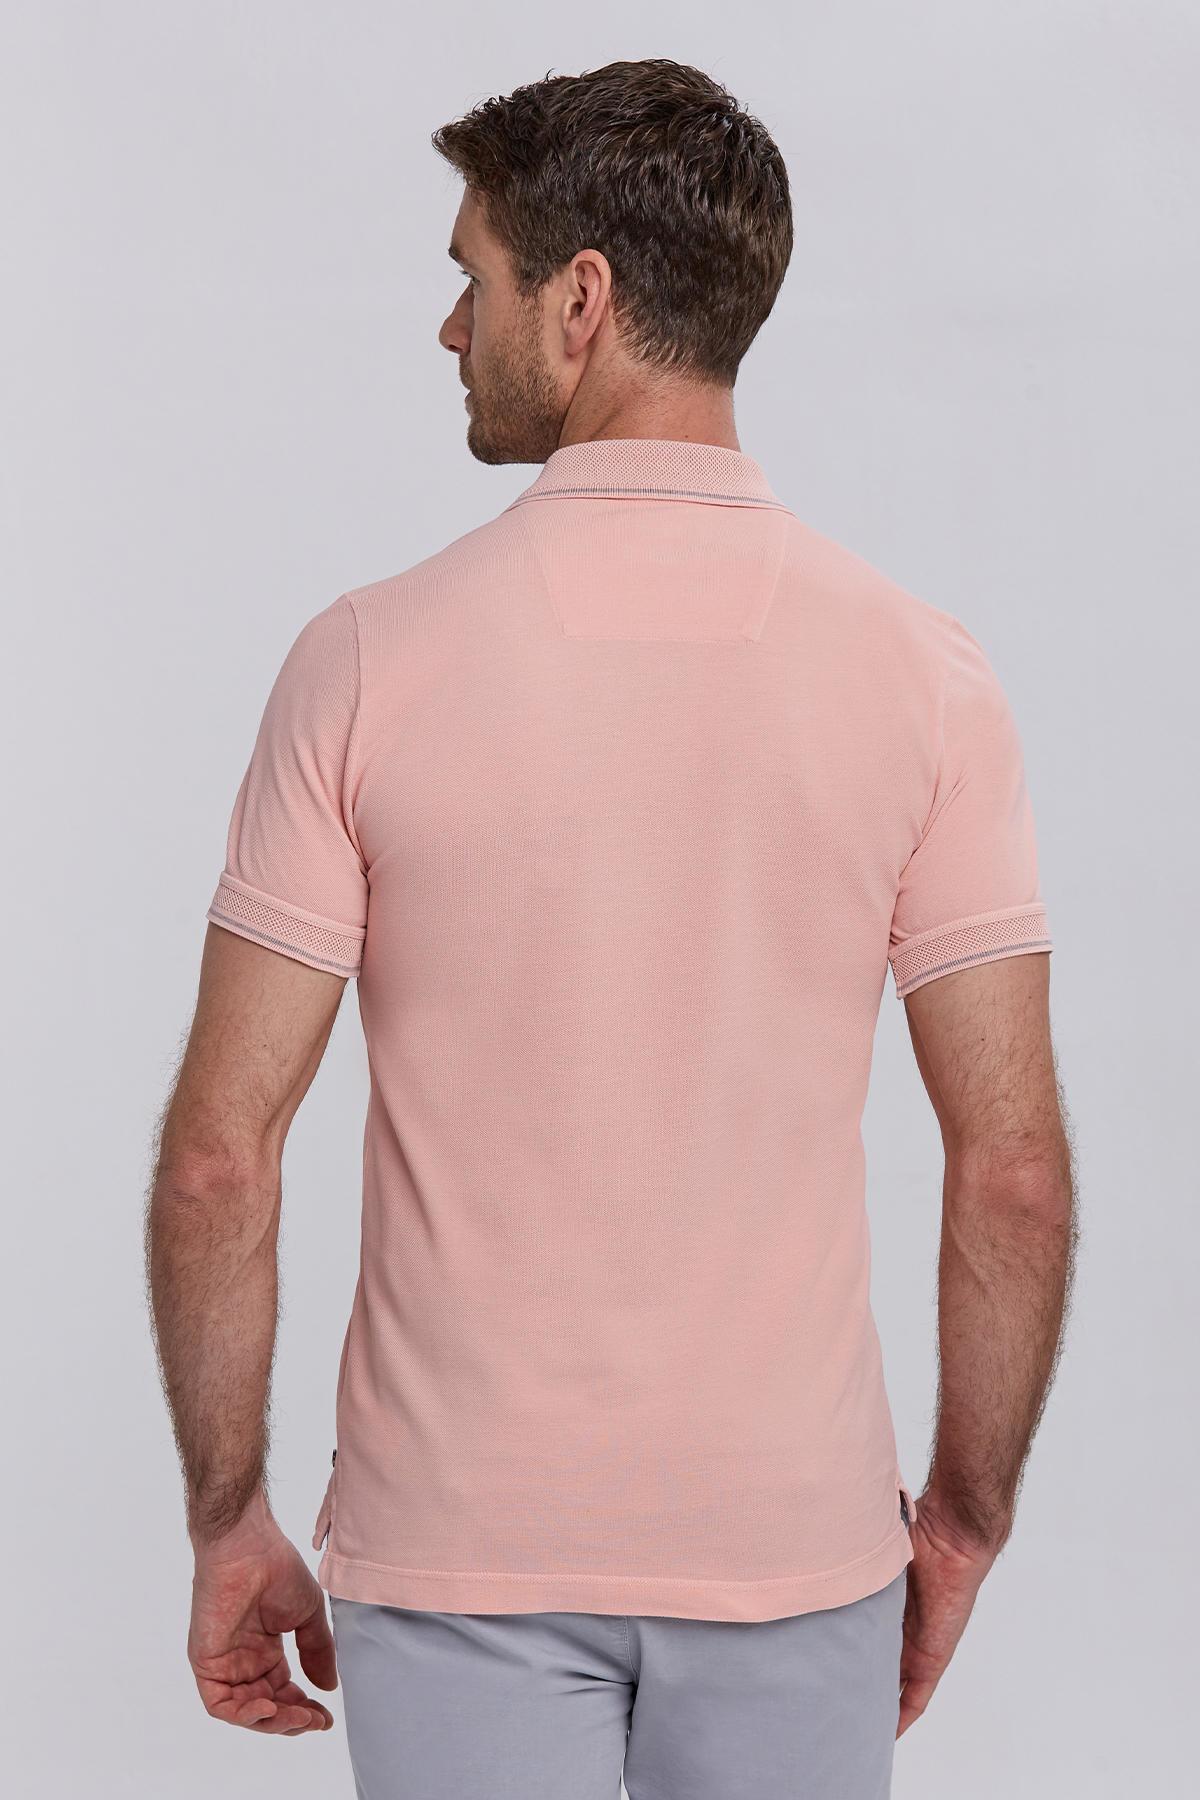 Vintage Görünümlü Pembe Polo Yaka T-Shirt